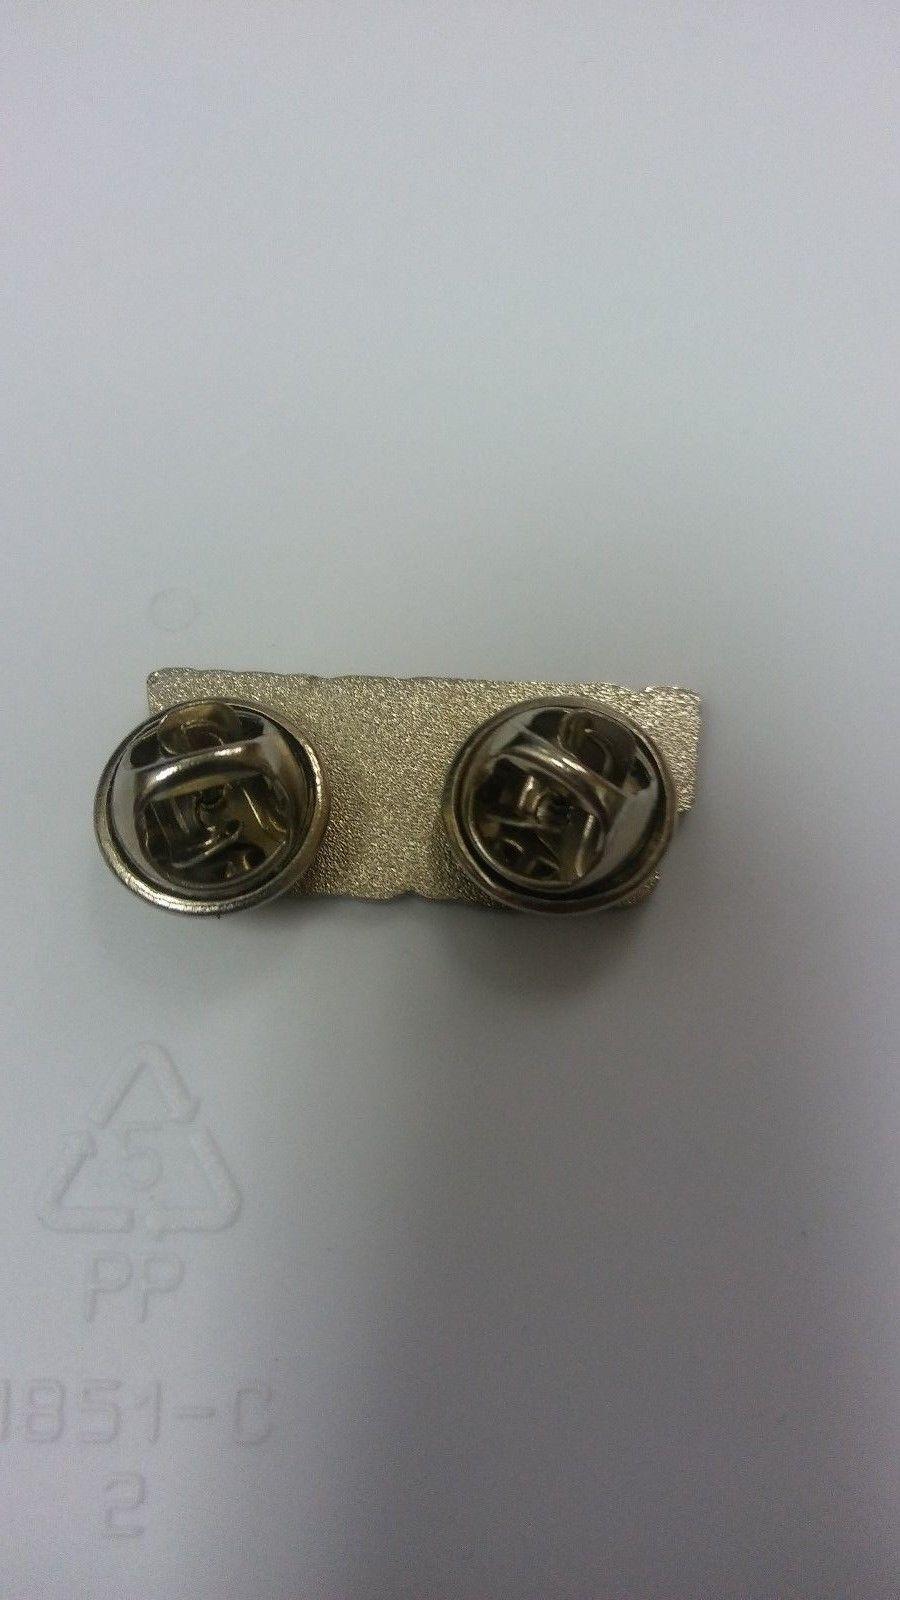 LowBrow Customs Skull Pin